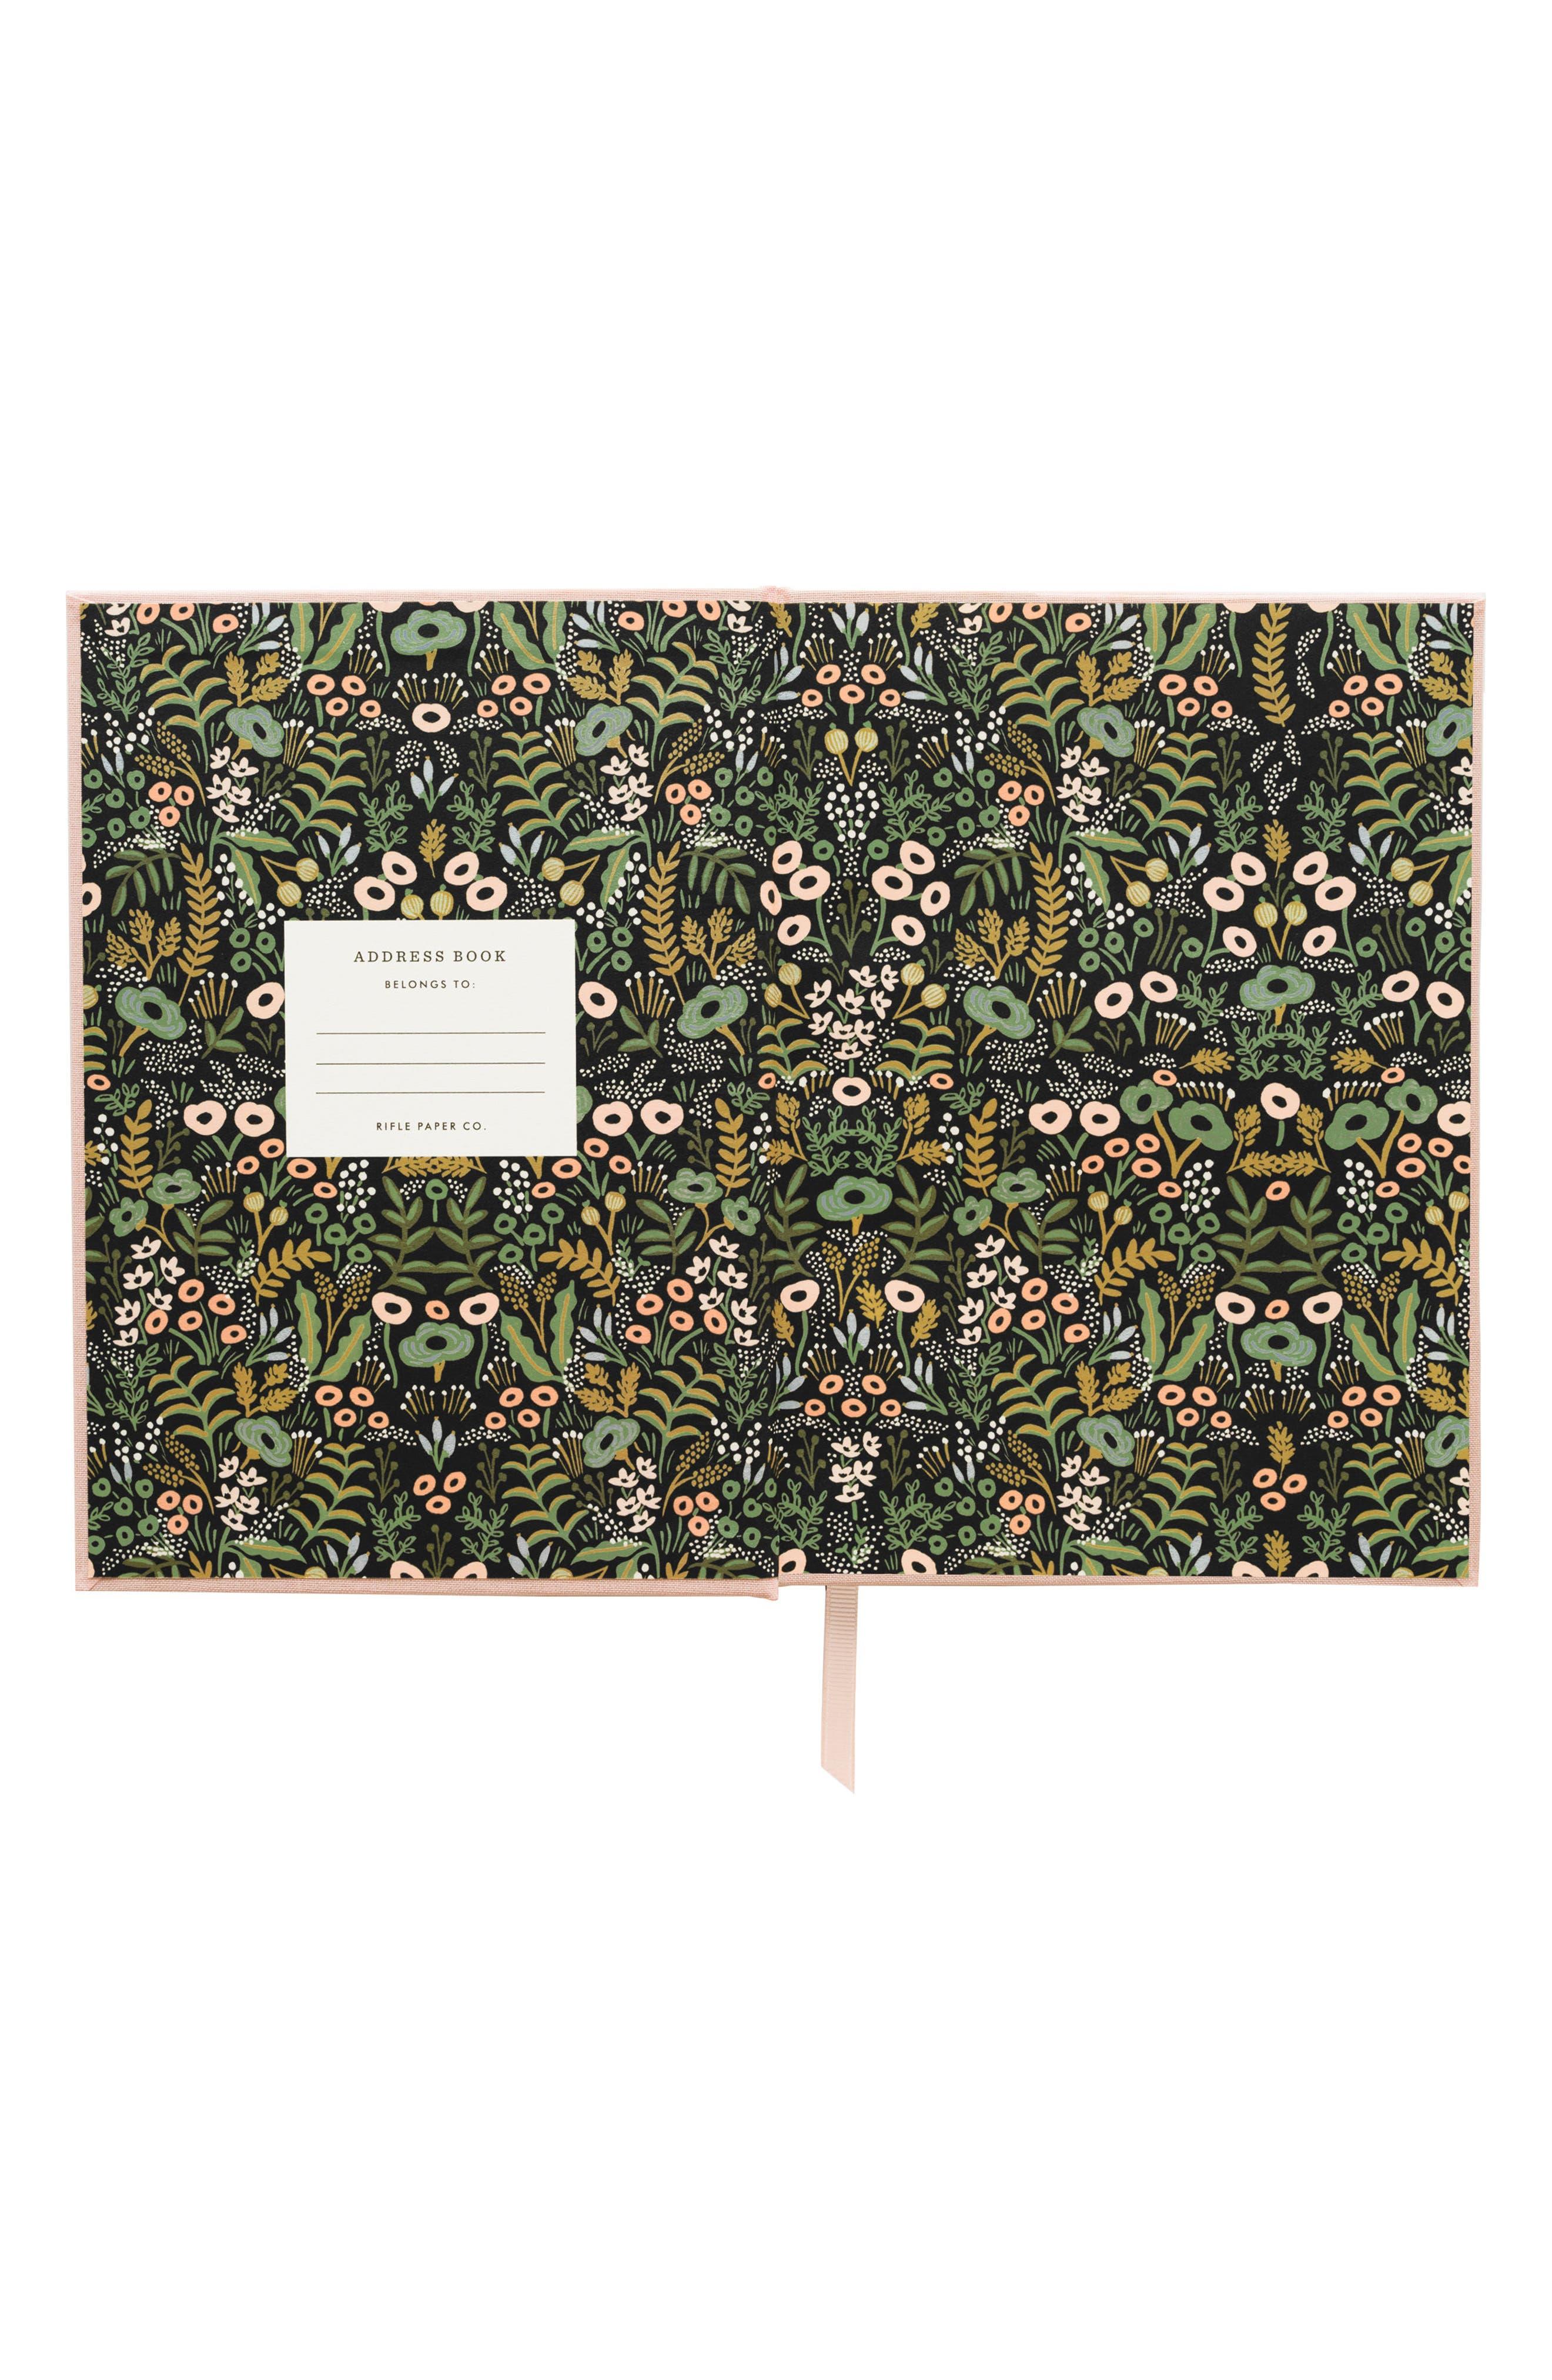 Blush Address Book,                             Alternate thumbnail 5, color,                             PINK